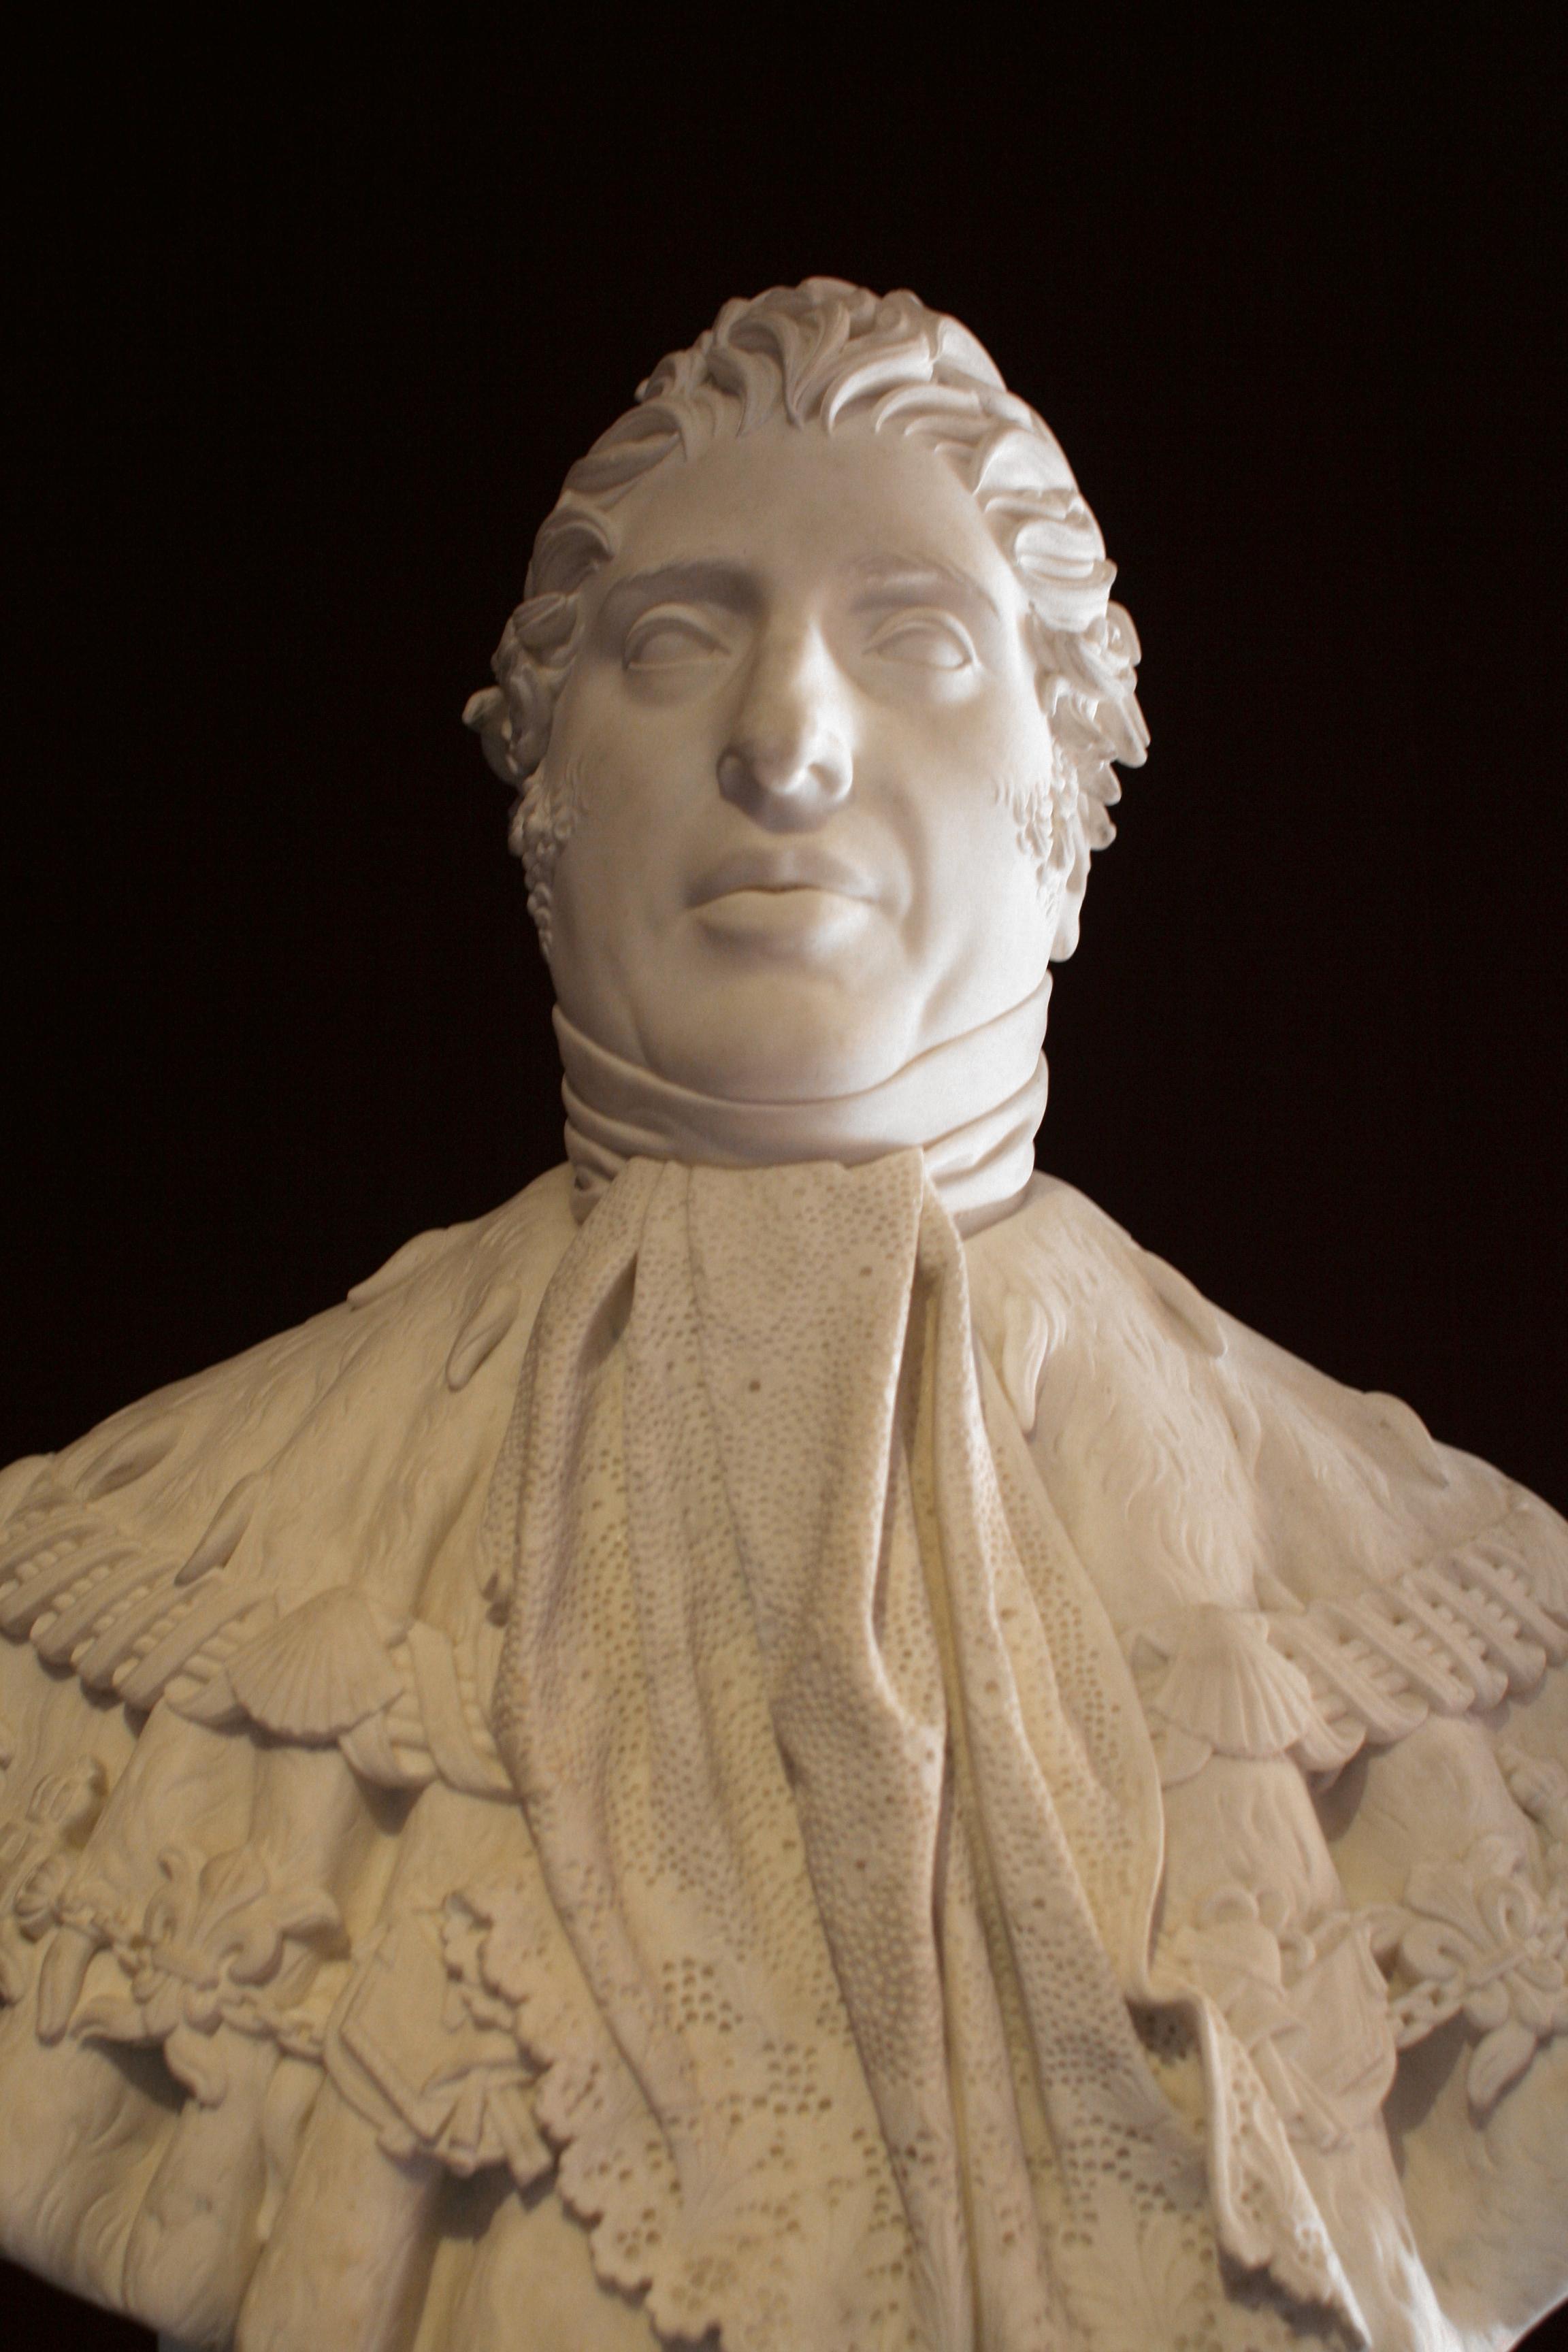 File:Buste de Charles X, 1825, François-Joseph Bosio 02 ...